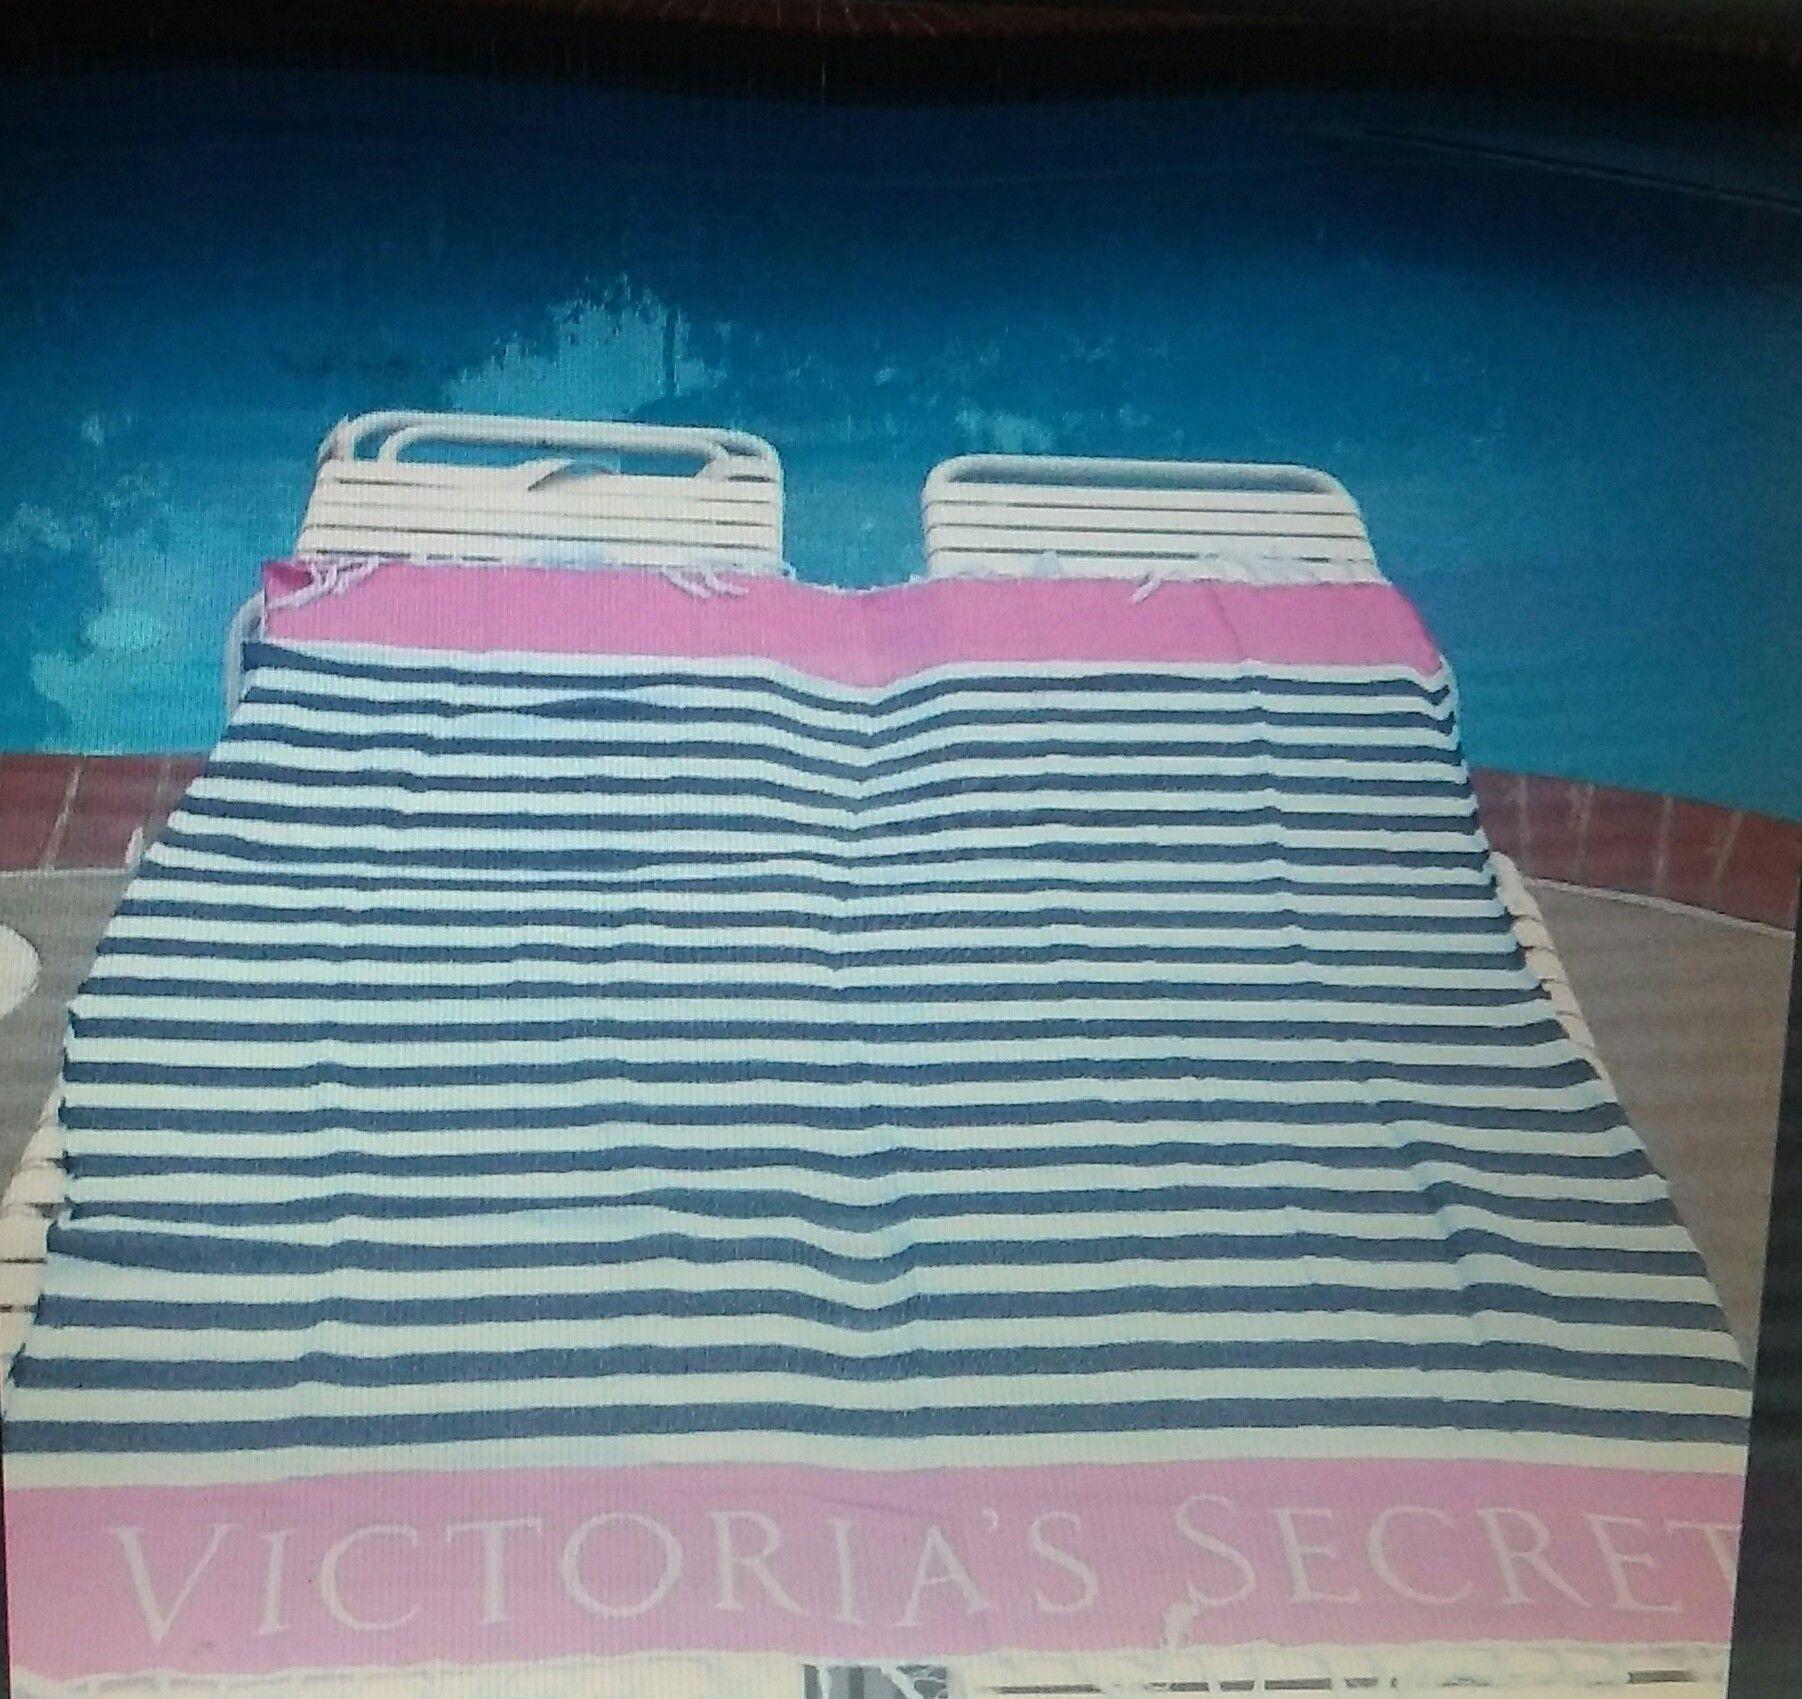 Victoria's Secret blanket.